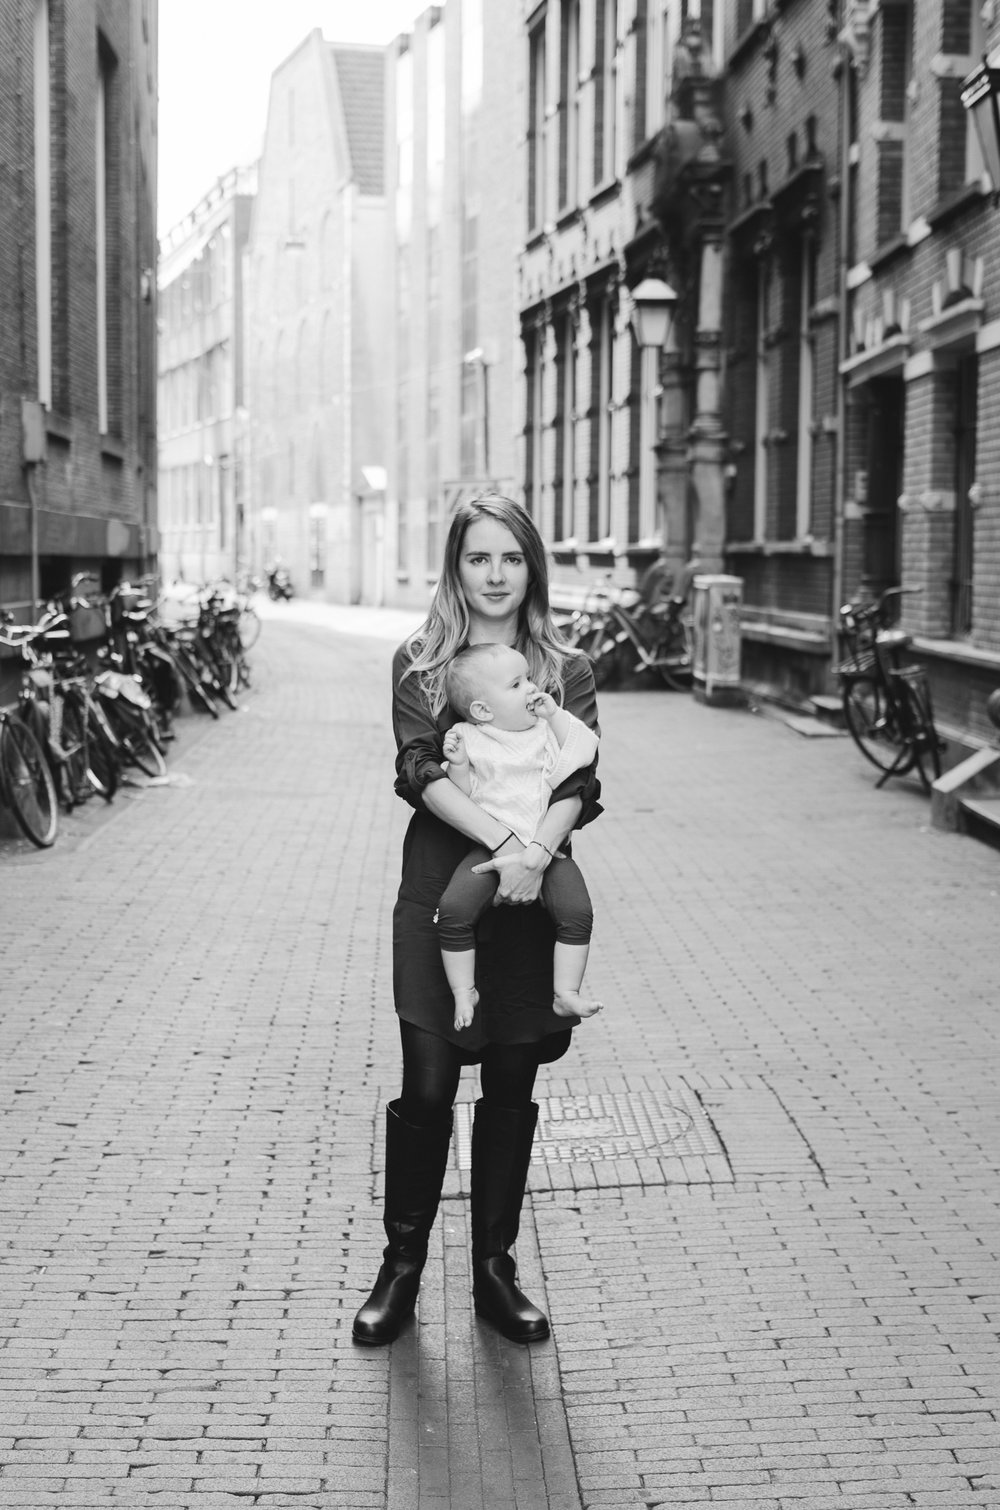 Vicky_McLachlan_Photography_Family_Newborn_Lifestyle_Photographer-11.jpg